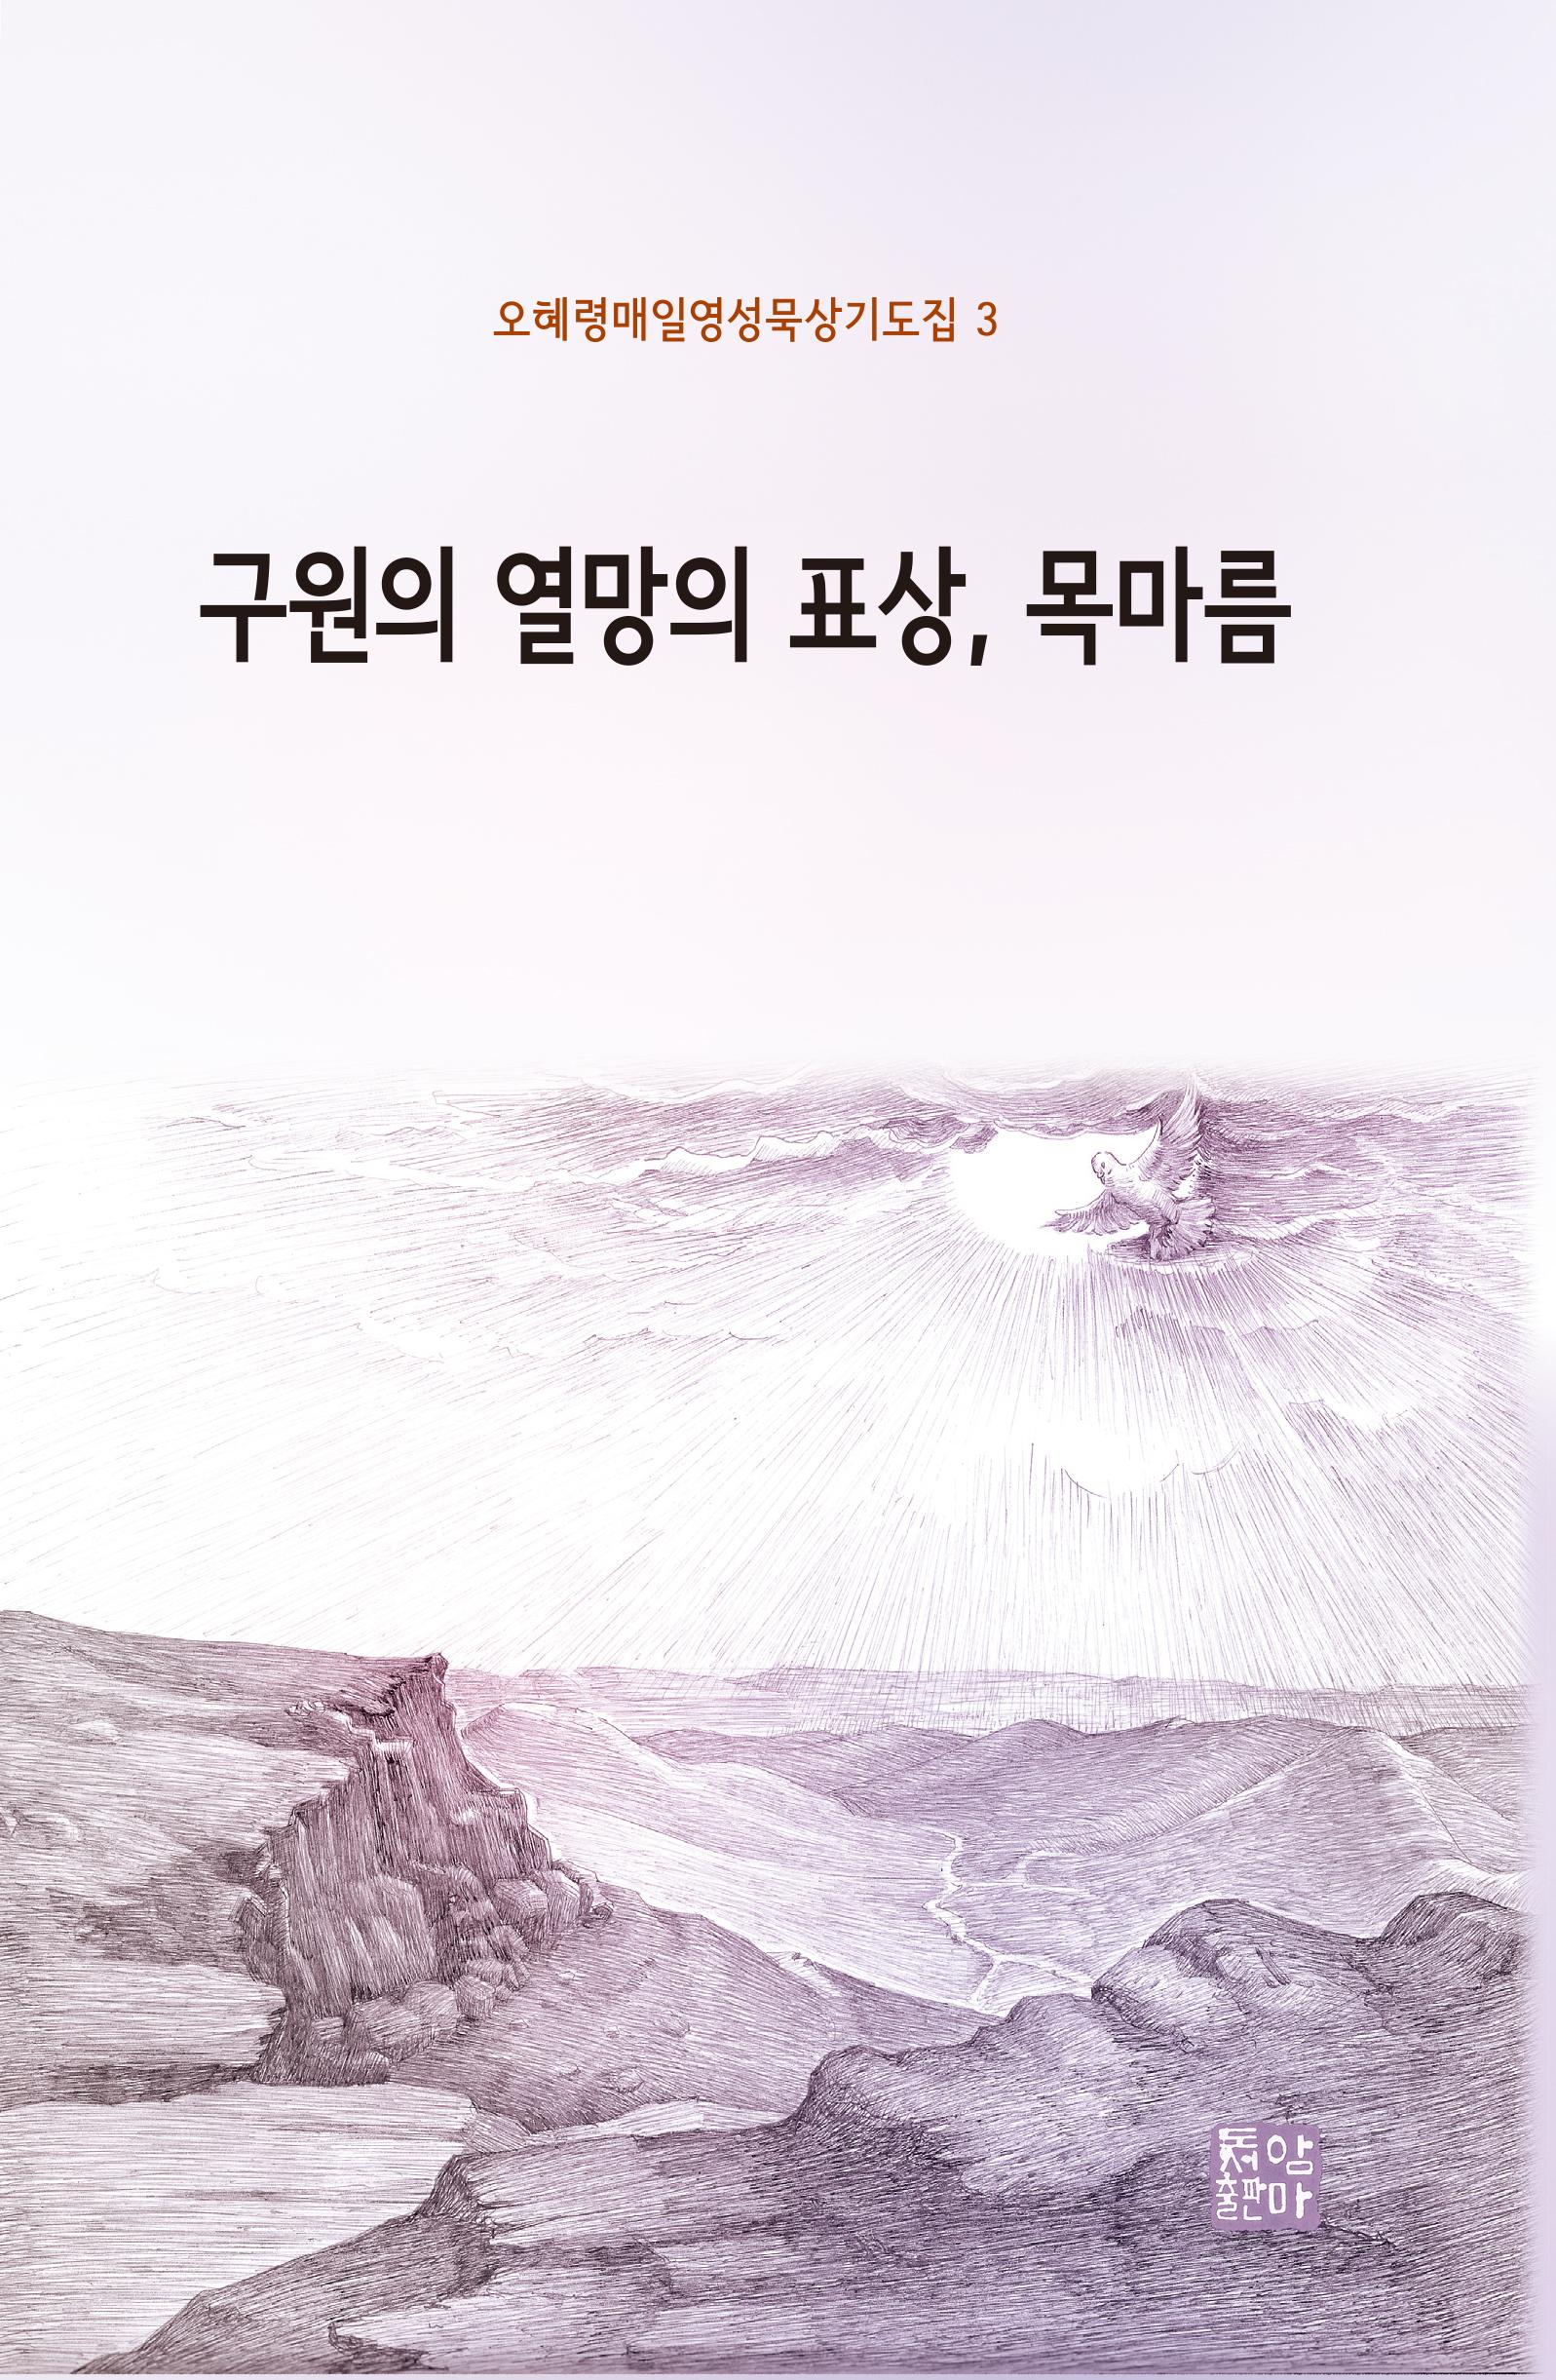 book61 구원의 열망의 표상, 목마름.jpg